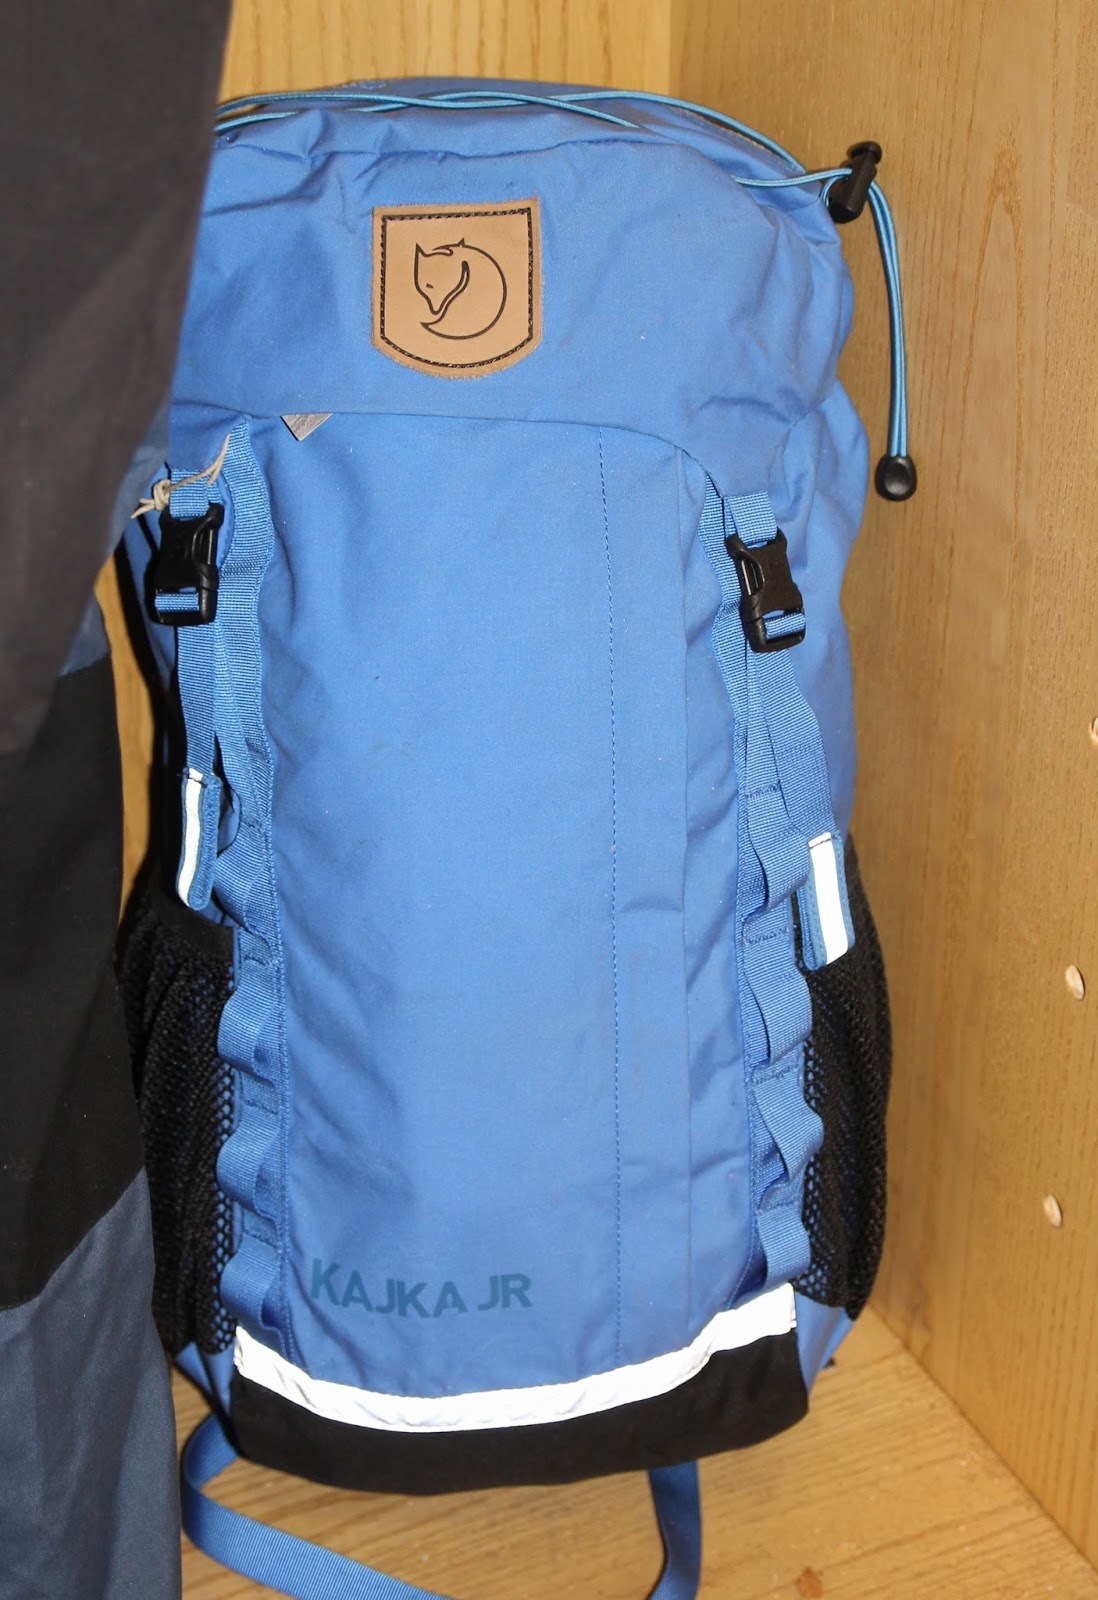 KAJKA JR in UN Blue…good size for women too. 038d8cf157721